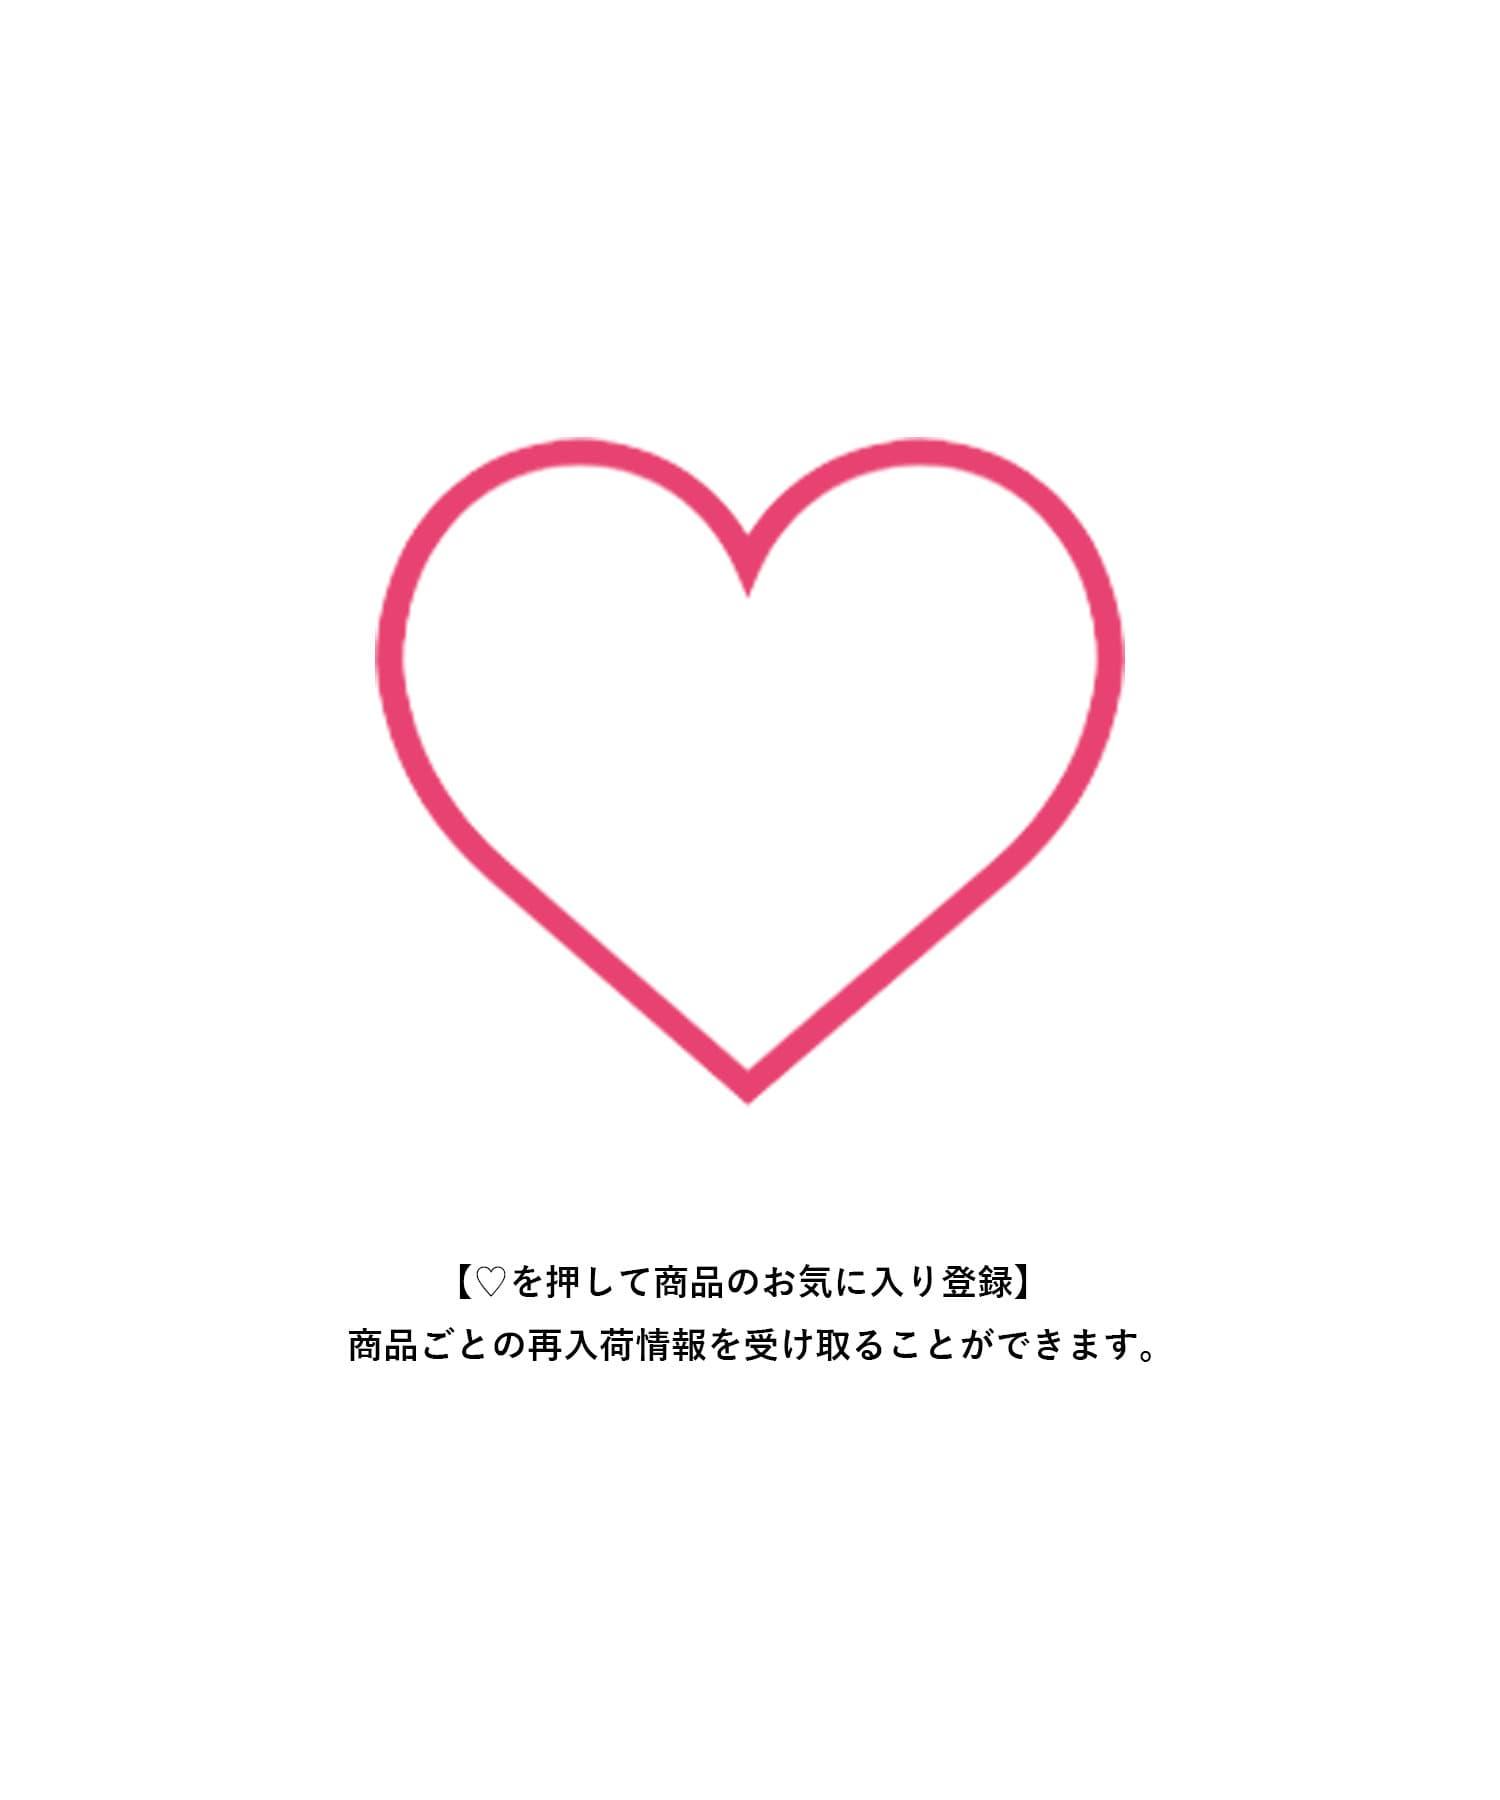 COLLAGE GALLARDAGALANTE(コラージュ ガリャルダガランテ) 【PAPILLONNER/パピヨネ】ハートイヤリング